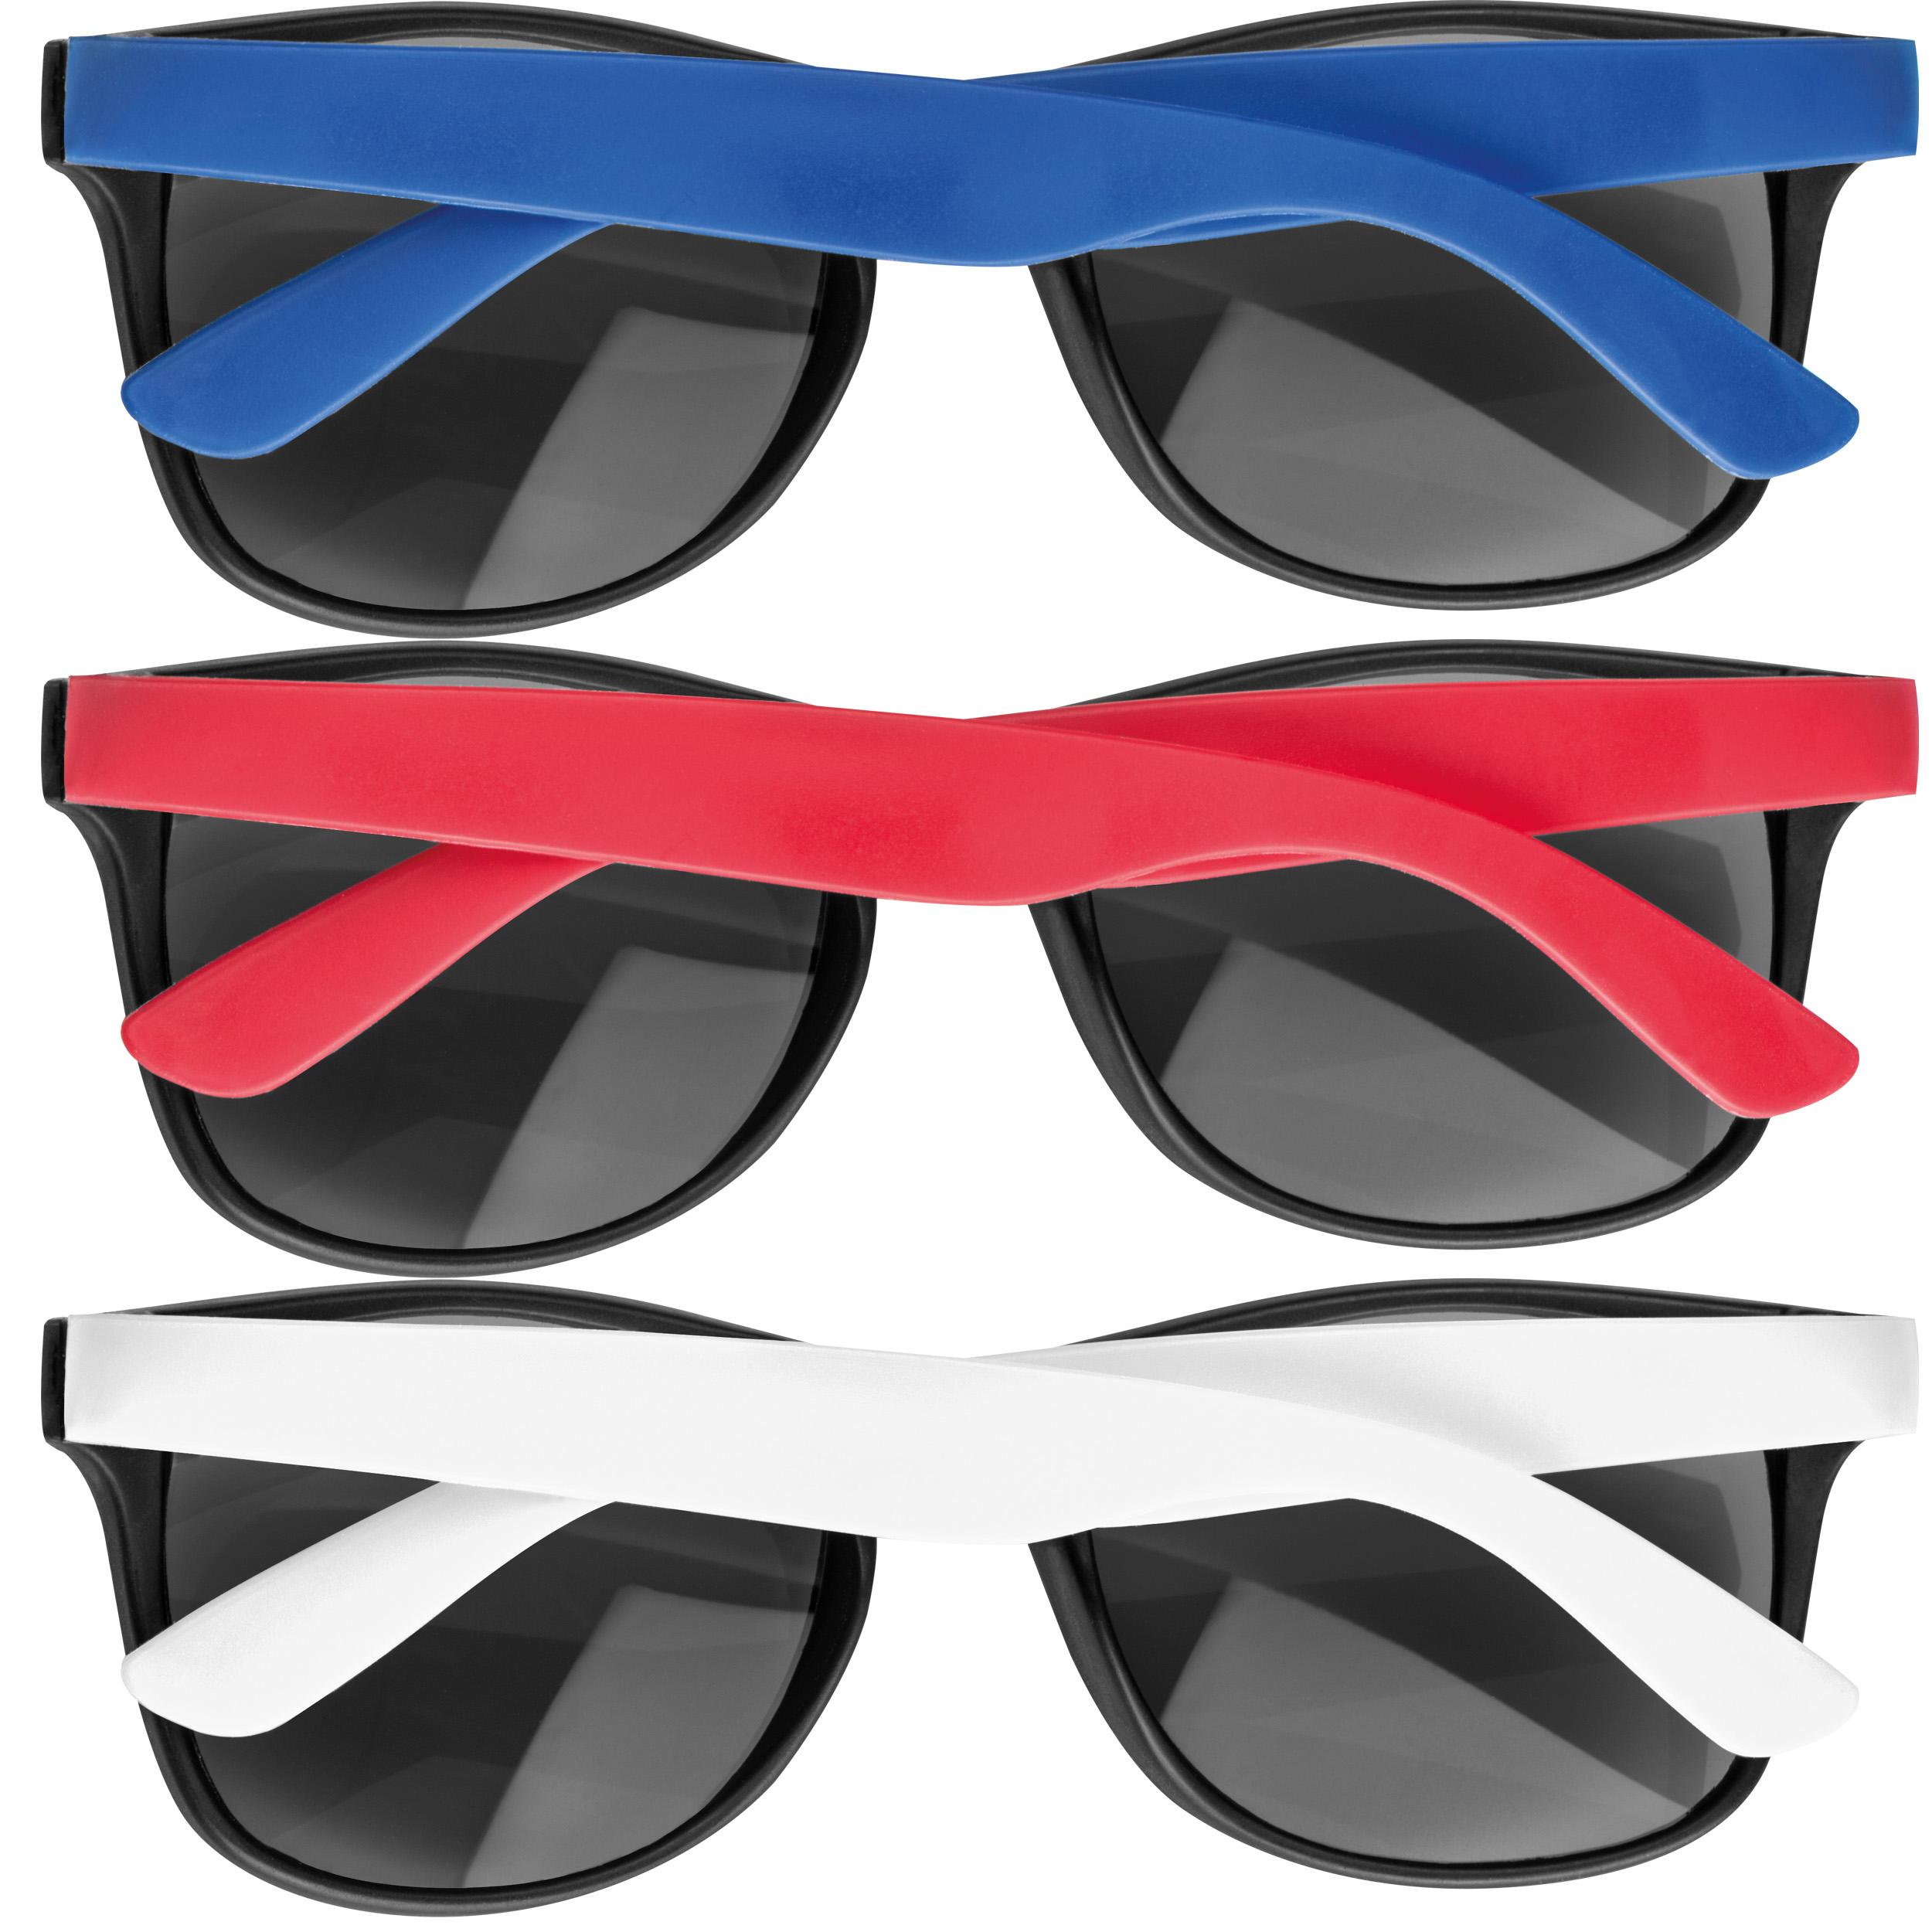 Sunglasses Nerdlook